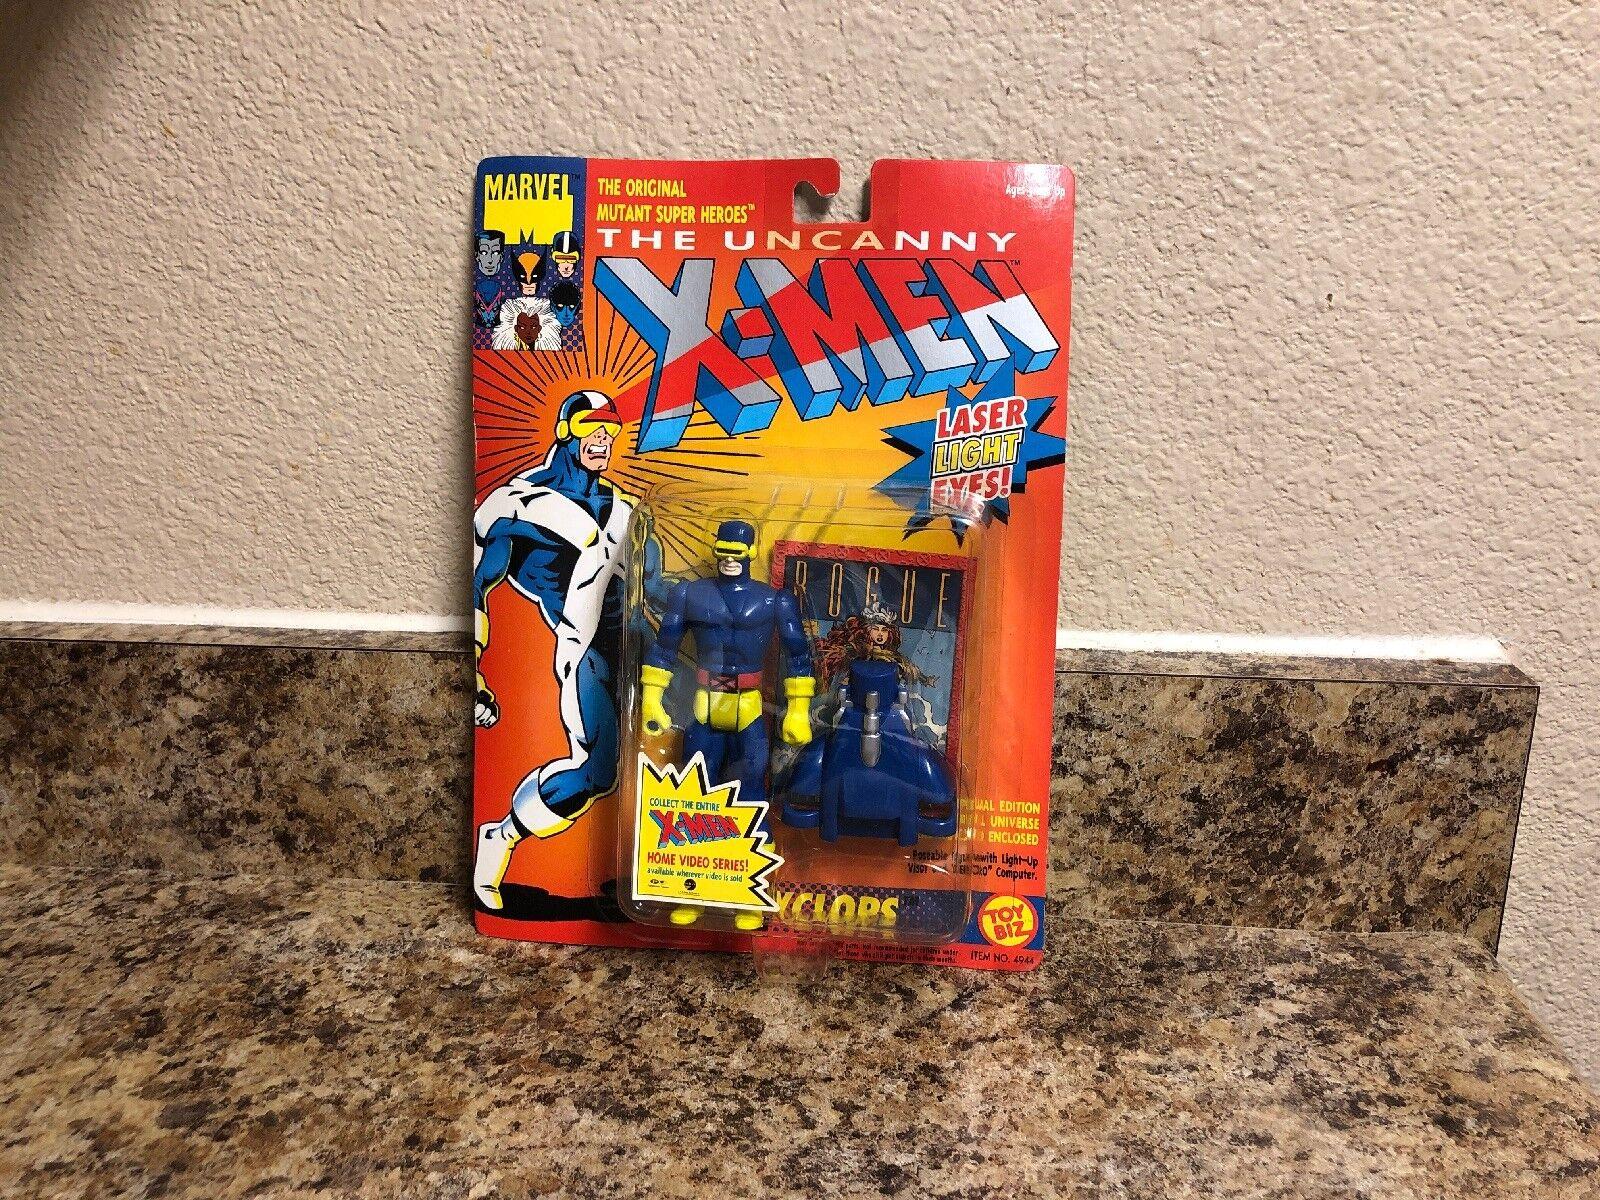 Marvel Comics The Uncanny X-MEN Action Figure Cyclops 1993 Toy-Biz 1.1 Brand New